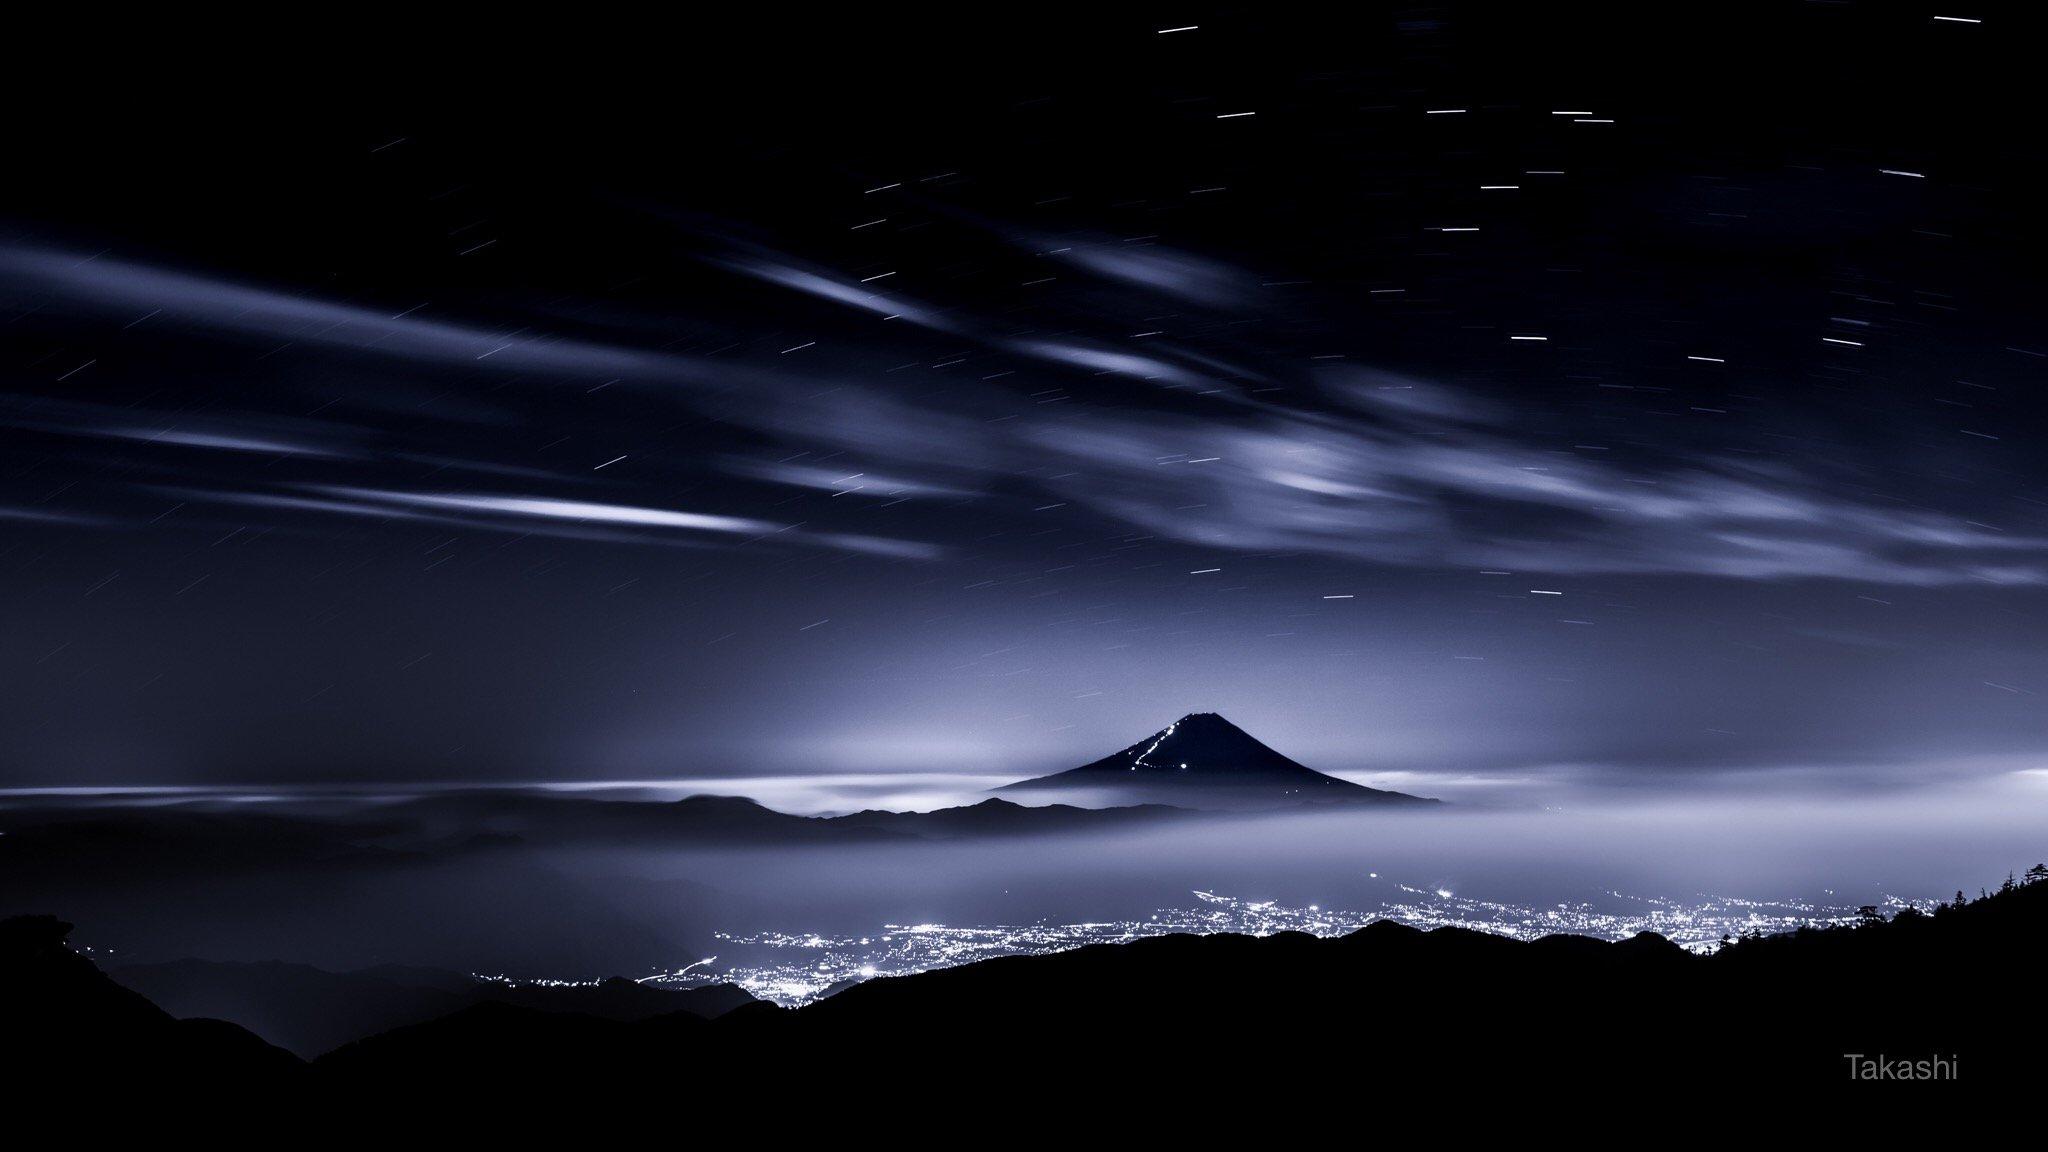 Fuji,Japan,mountain,clouds,star,, Takashi